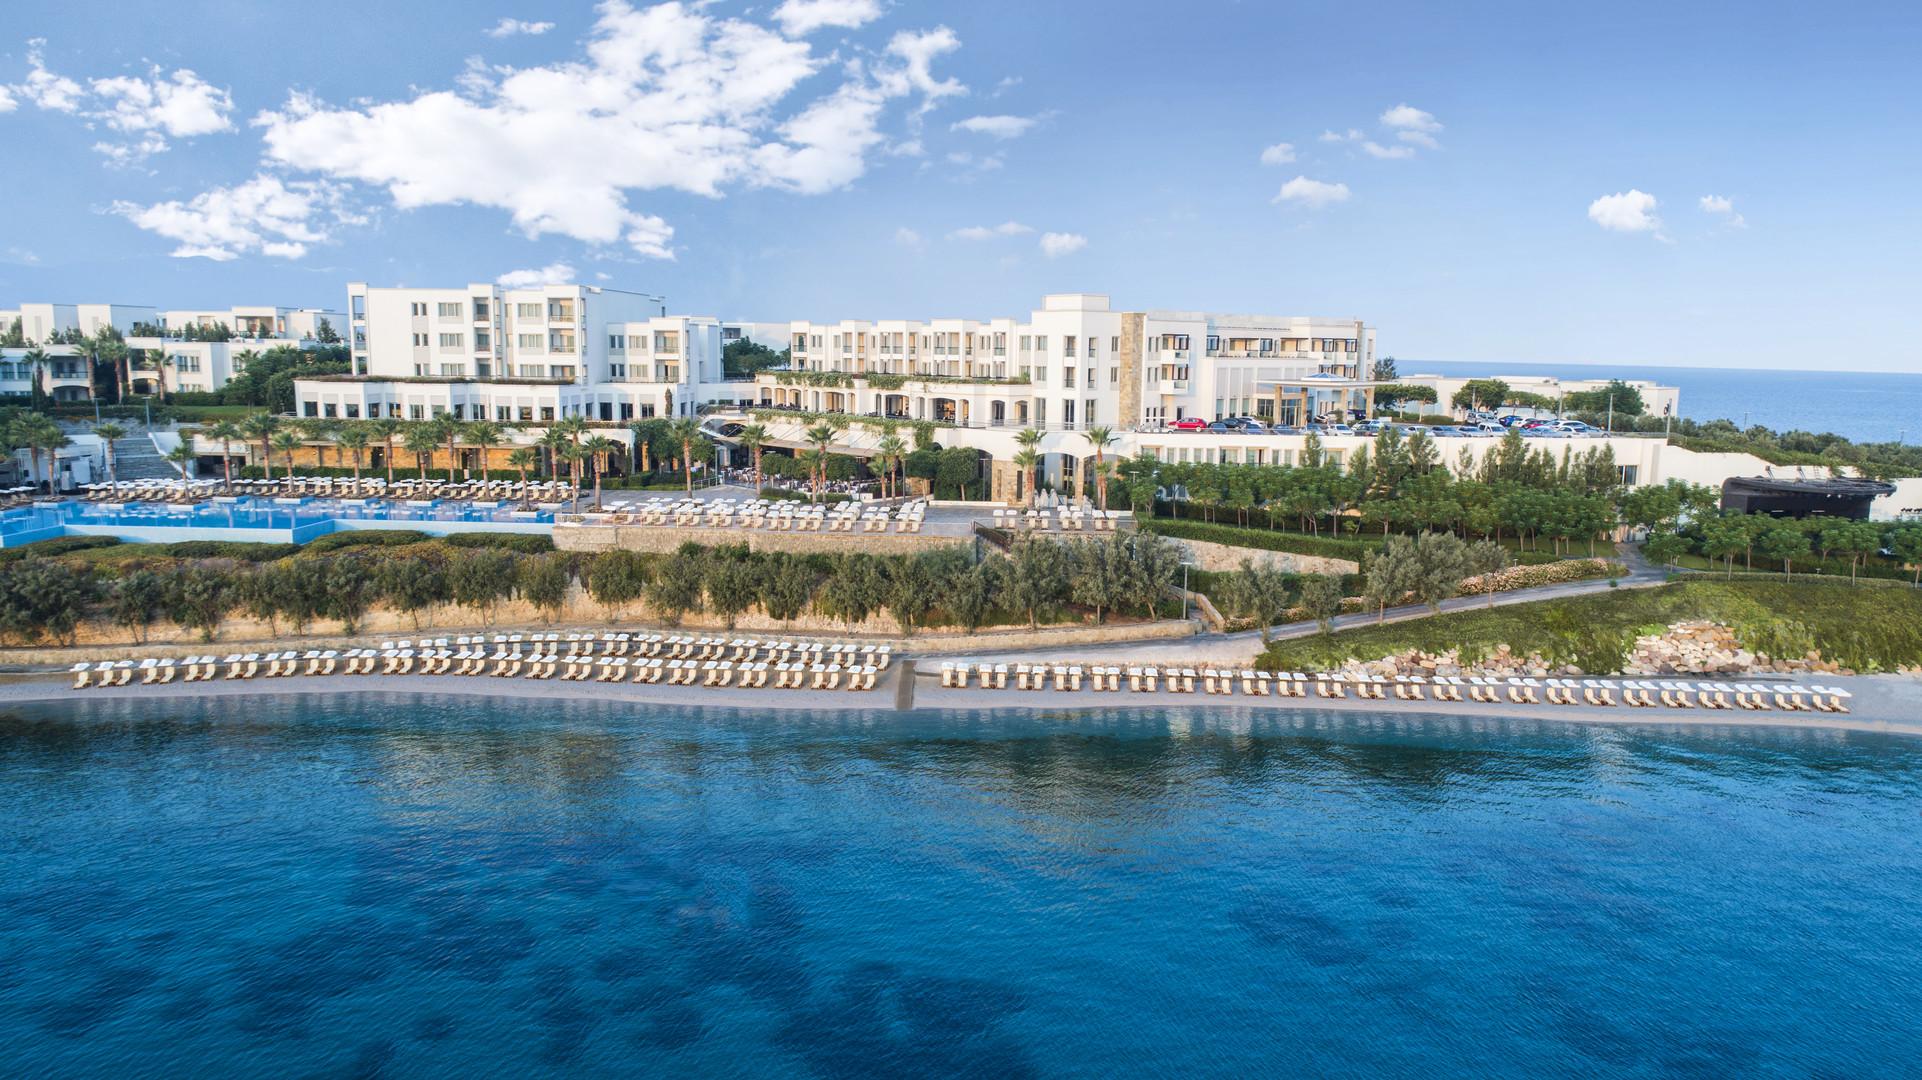 Hotel Xanadu Island #5